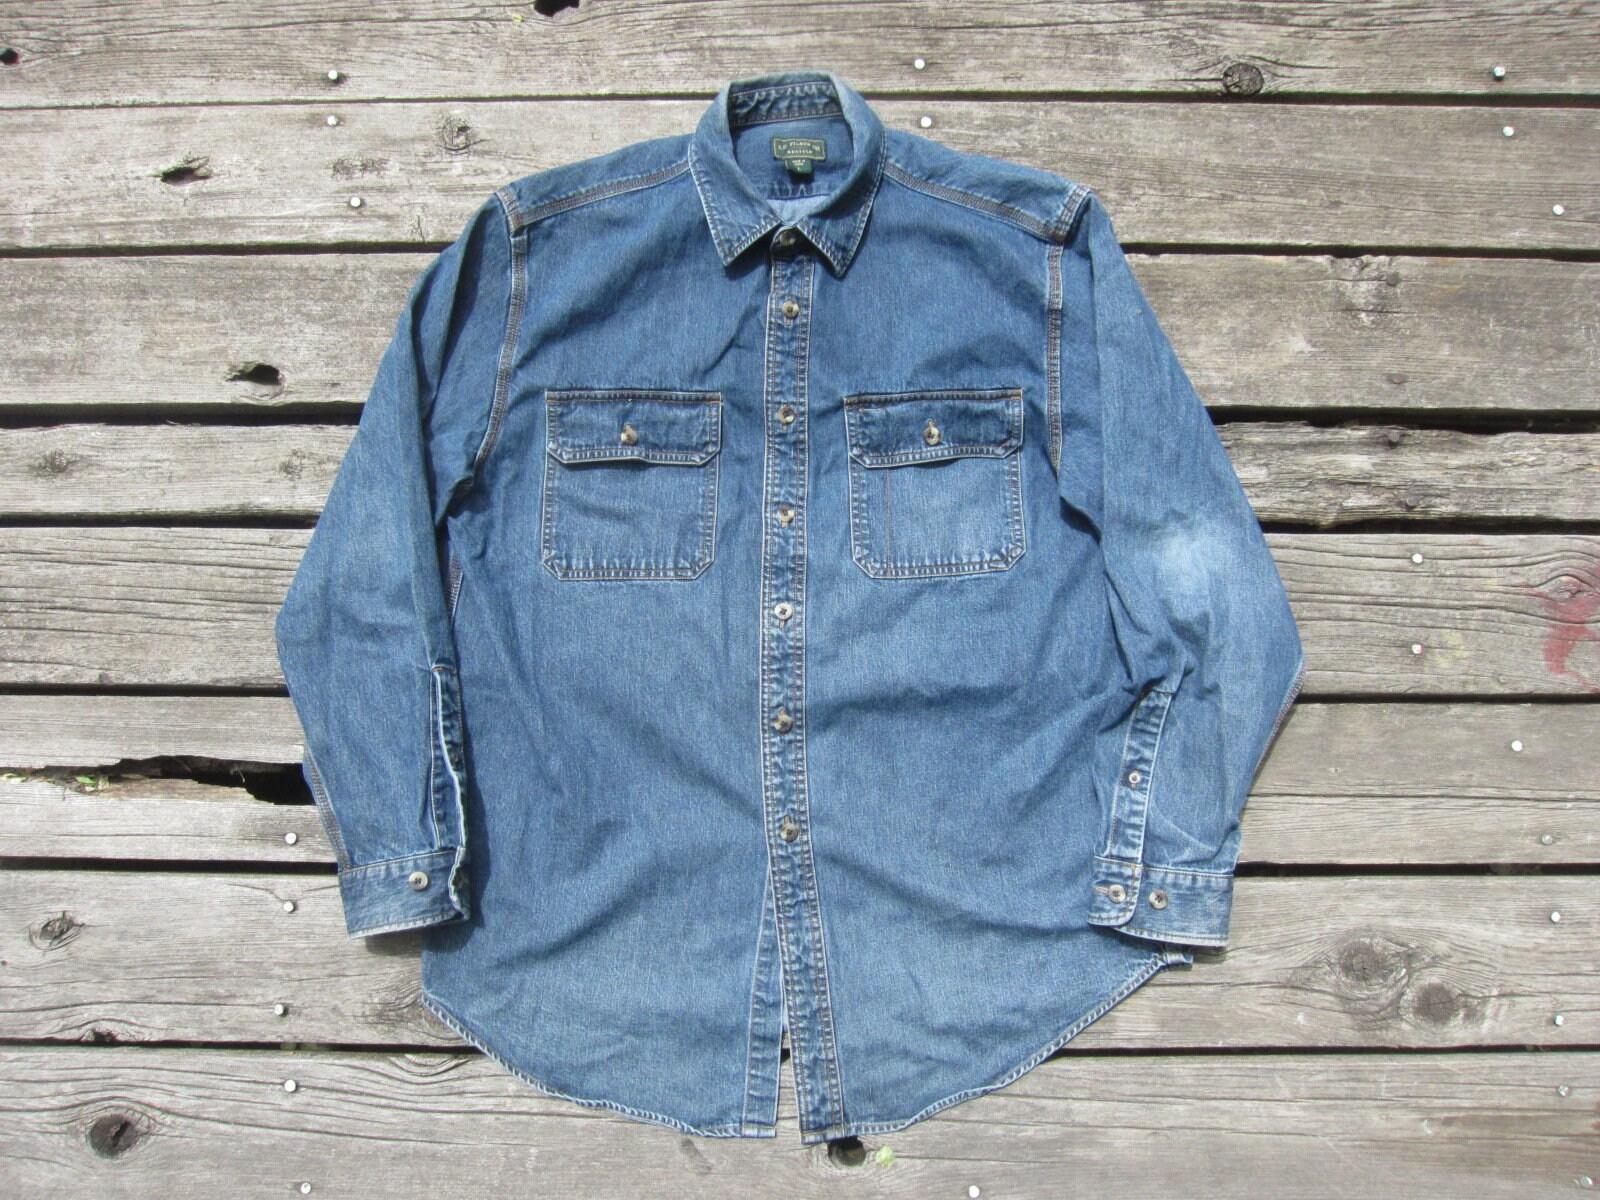 f5acb214d Large / Medium CC Filson Denim Work Shirt / Triple Stitched, Button Up  Down, Collared Collar, Blue Indigo Cotton